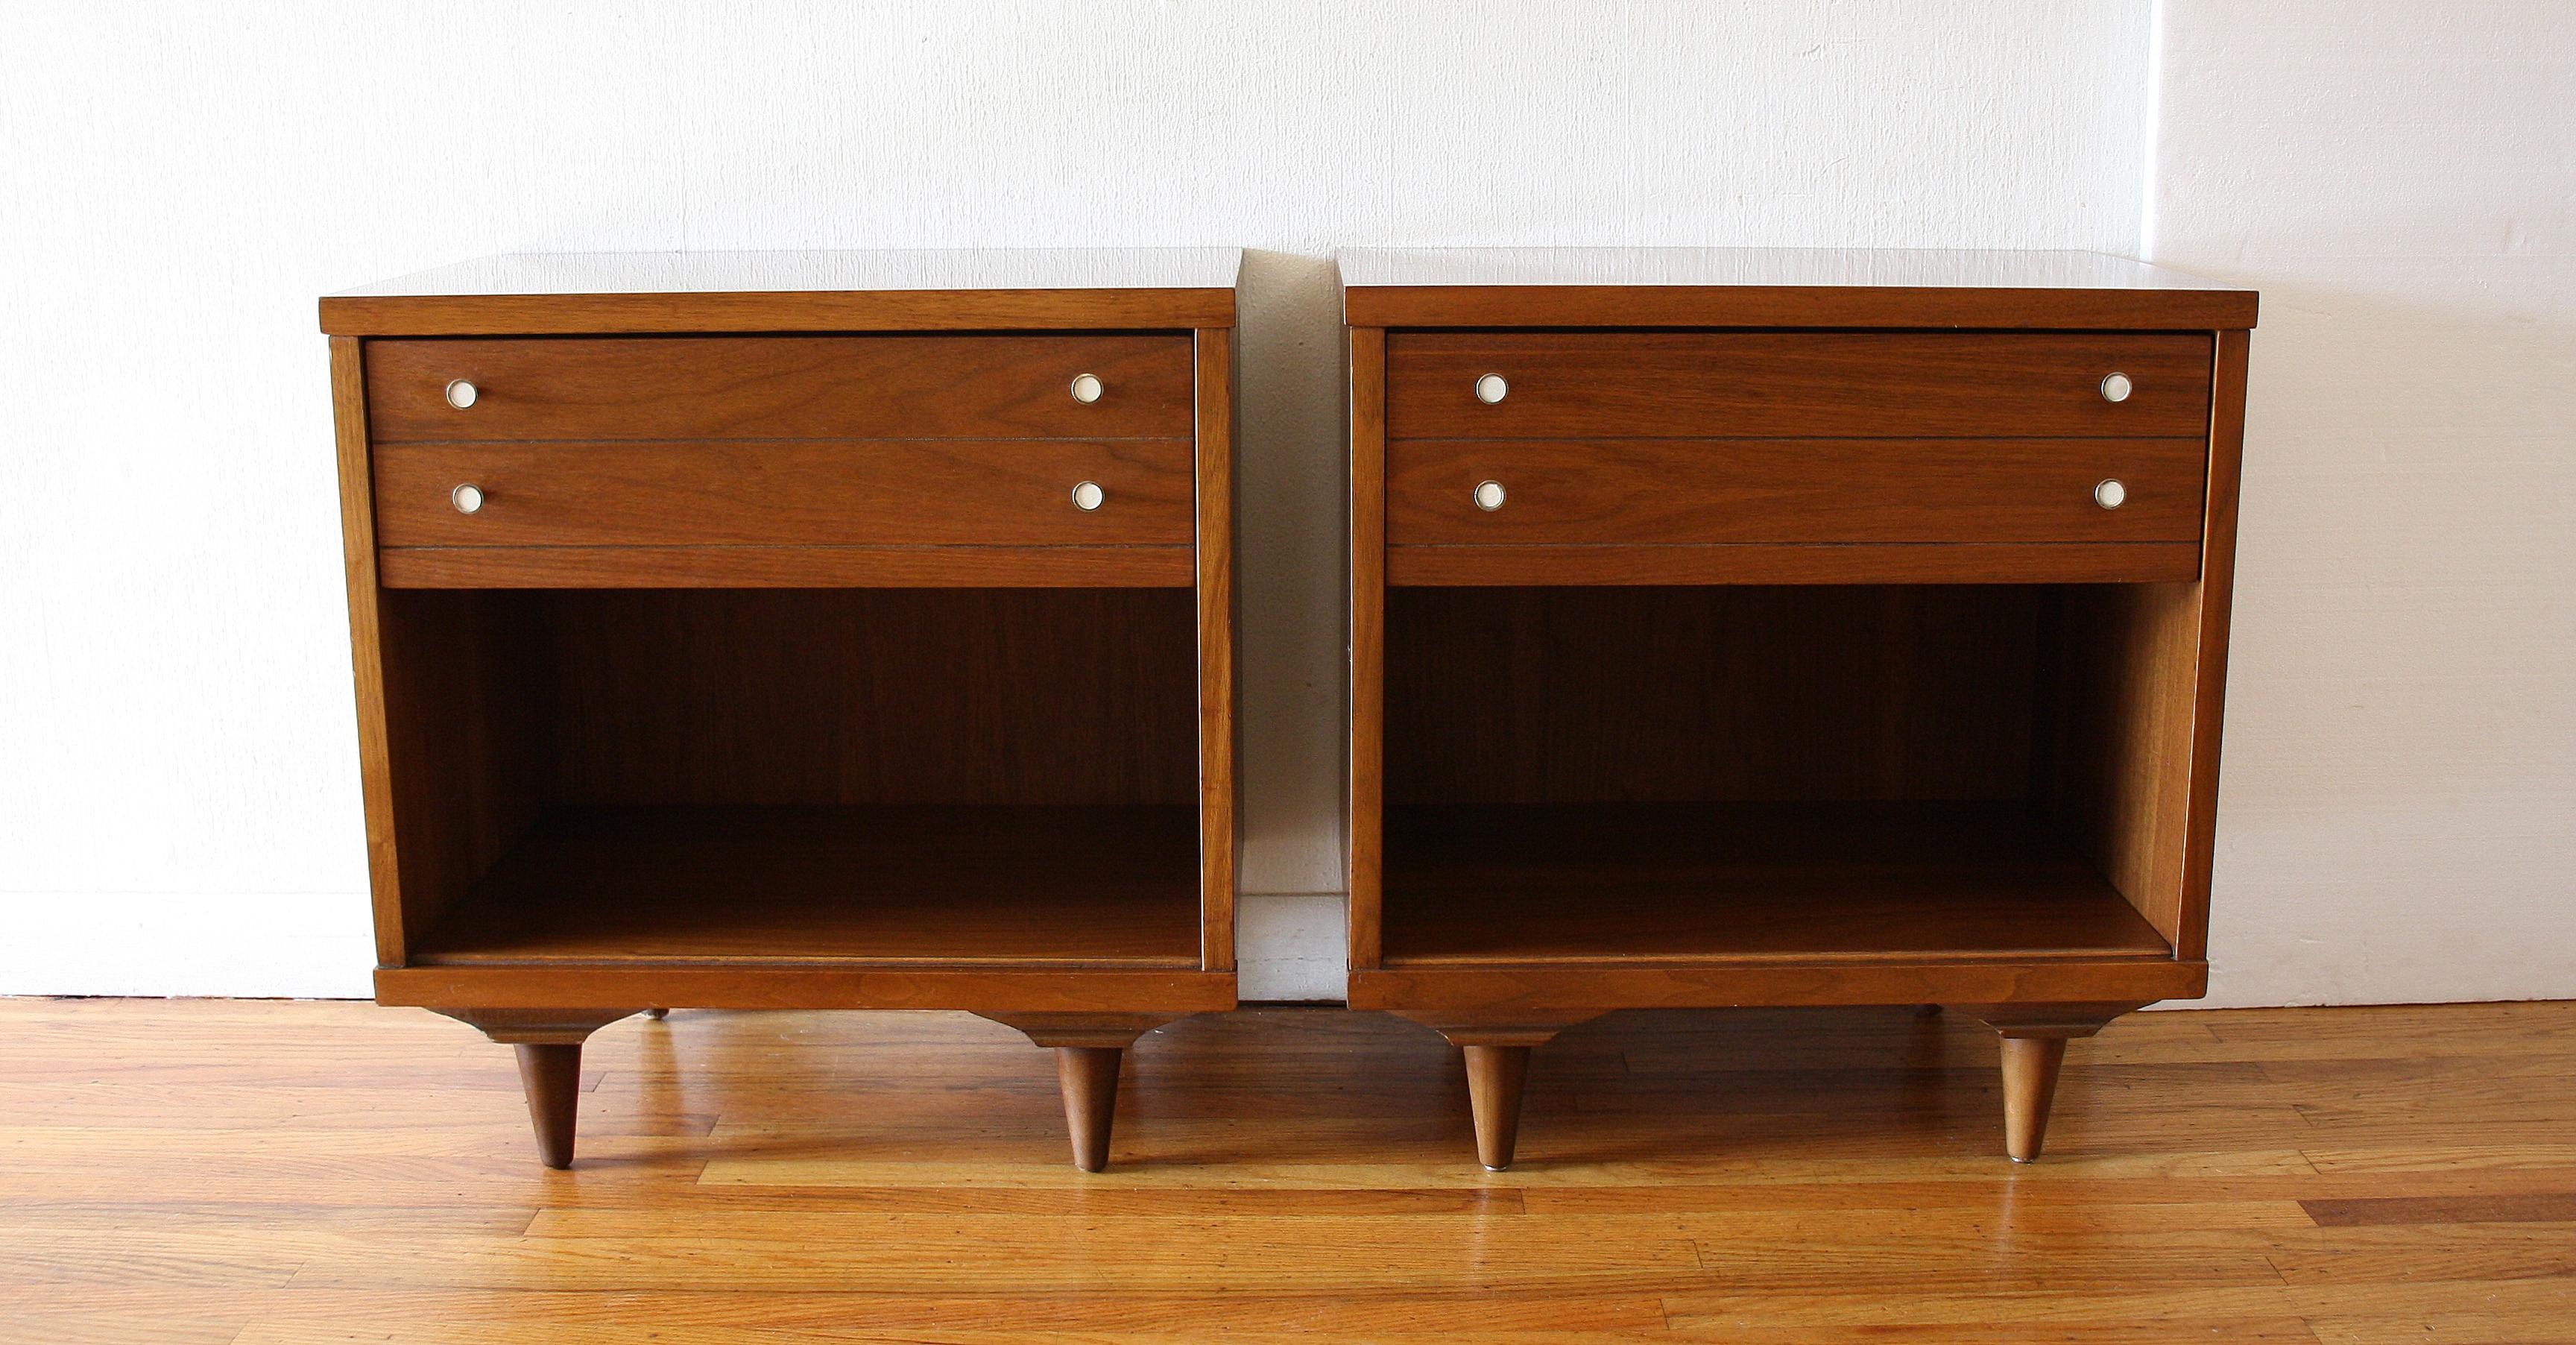 Johnson carper pair of nightstands white knobs 1